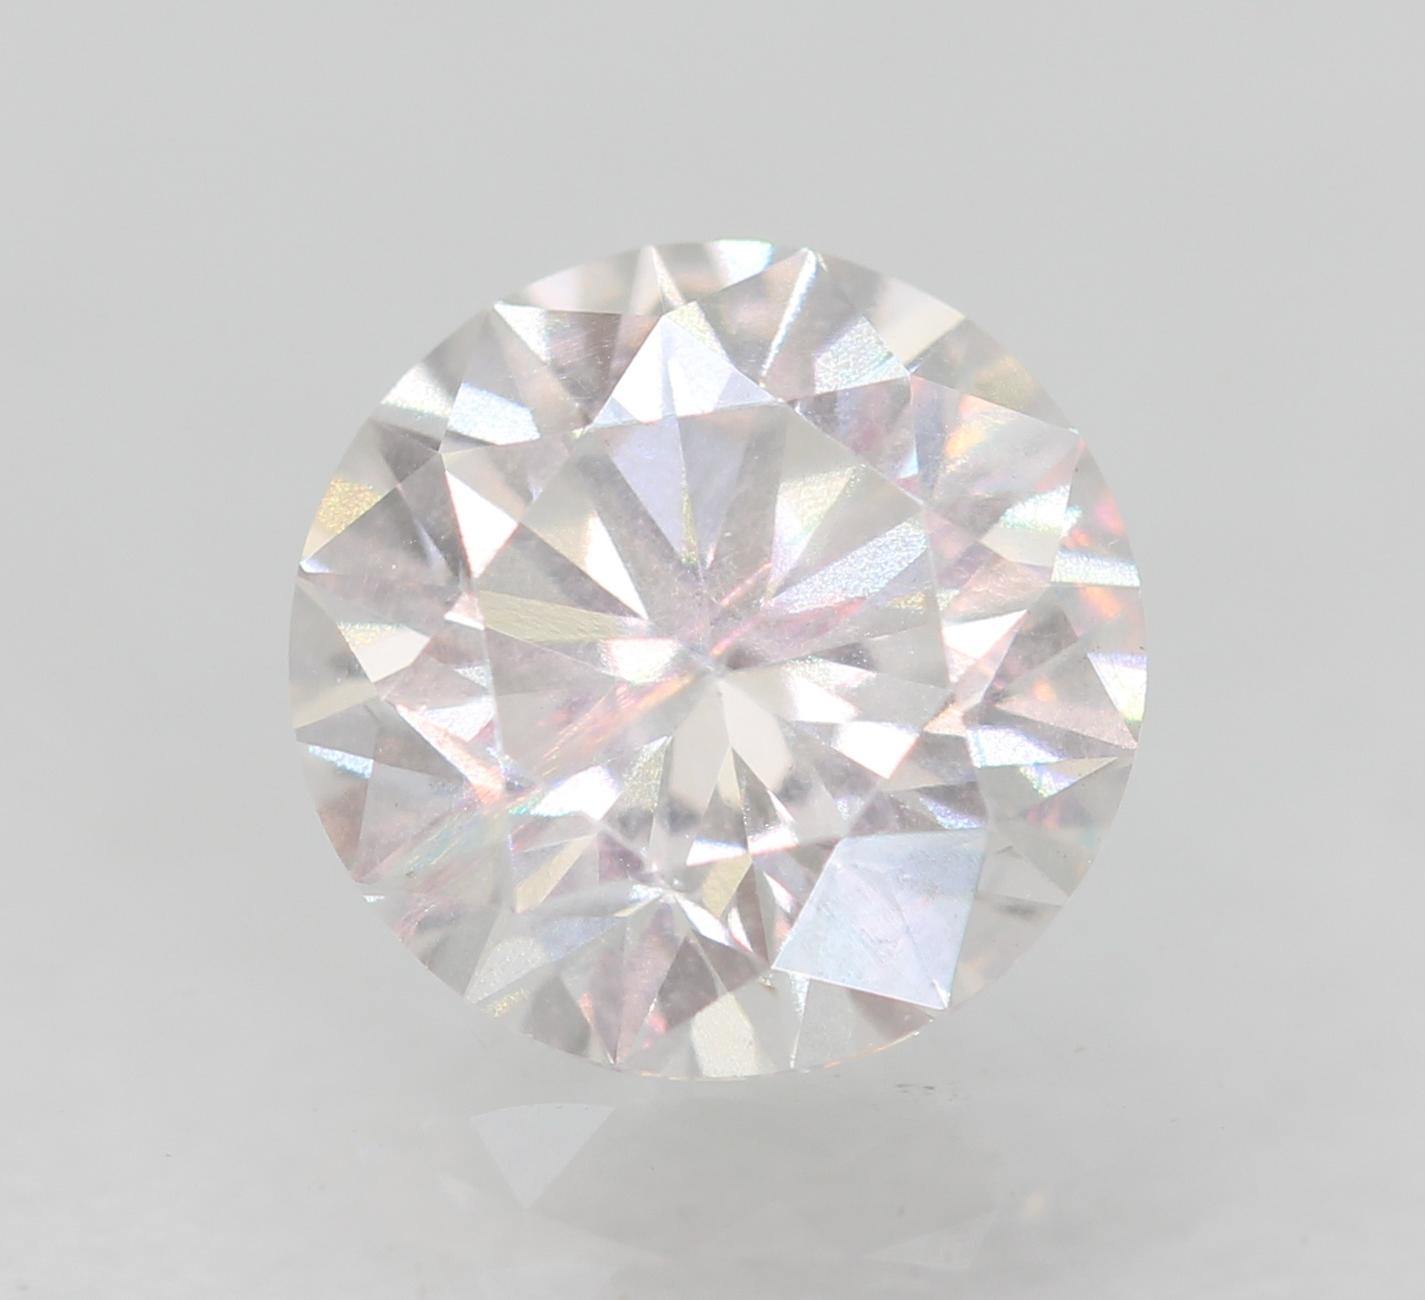 Certified 0.63 Carat D VS2 Round Brilliant Enhanced Natural Diamond 5.45m EX CUT